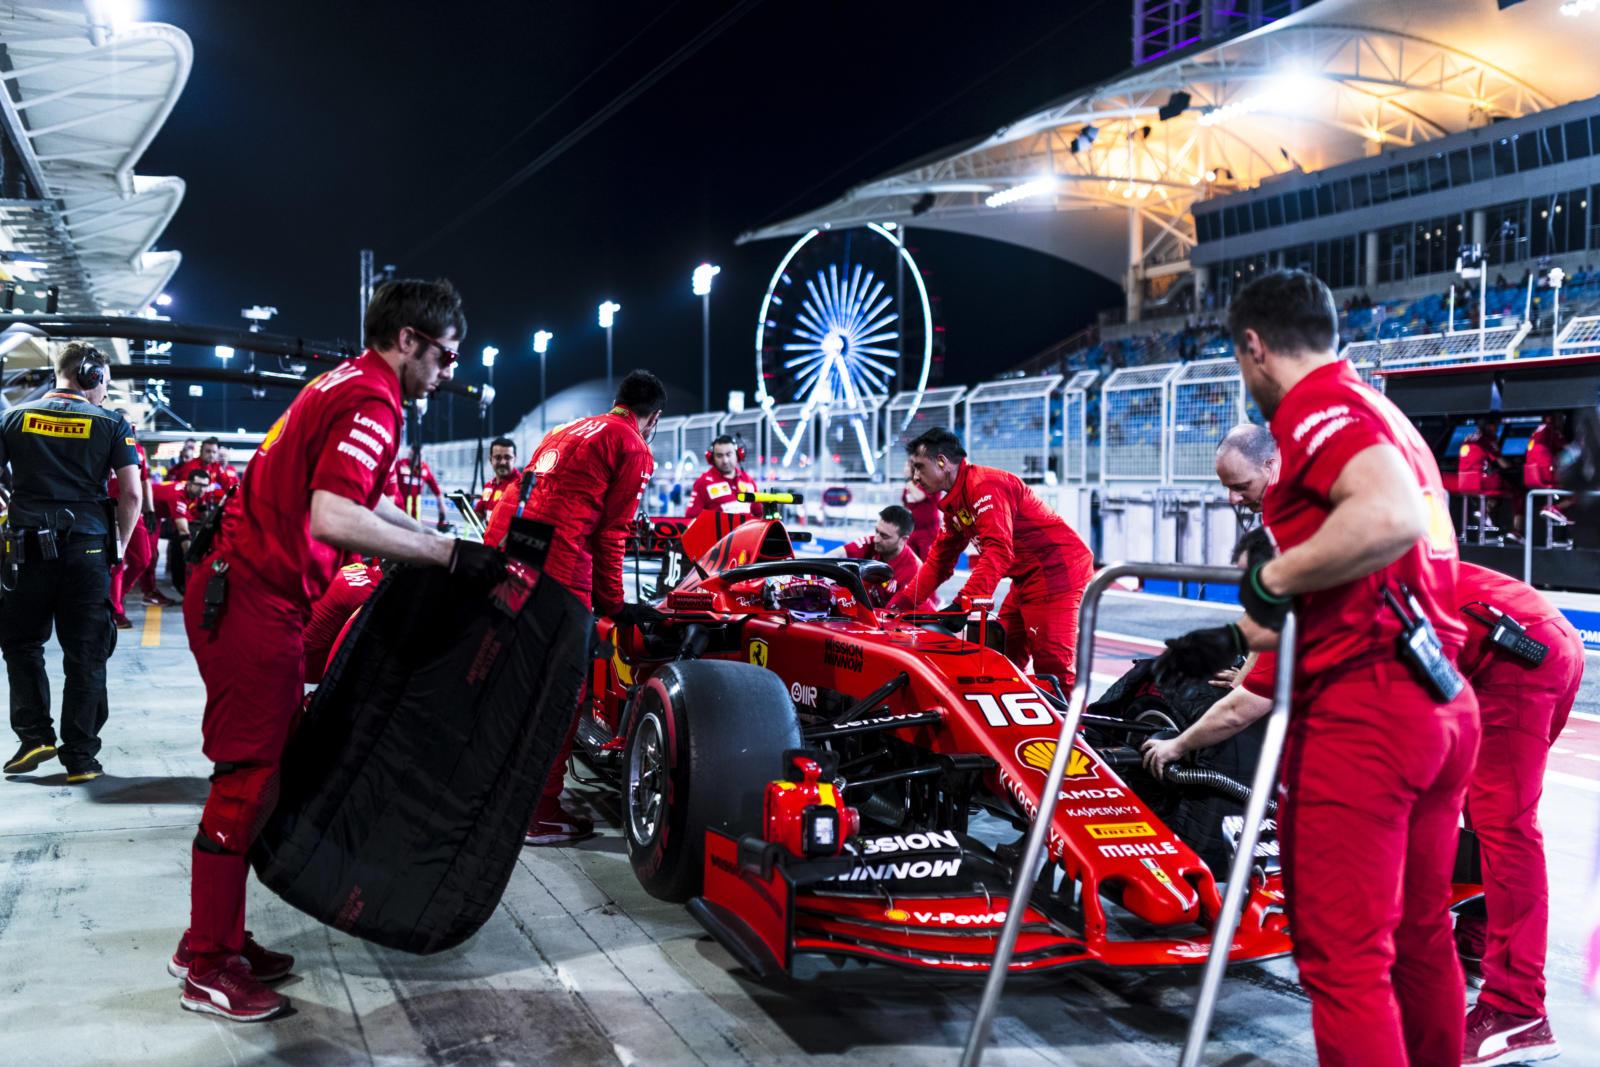 bahrain-grand-prix-2019-formula1